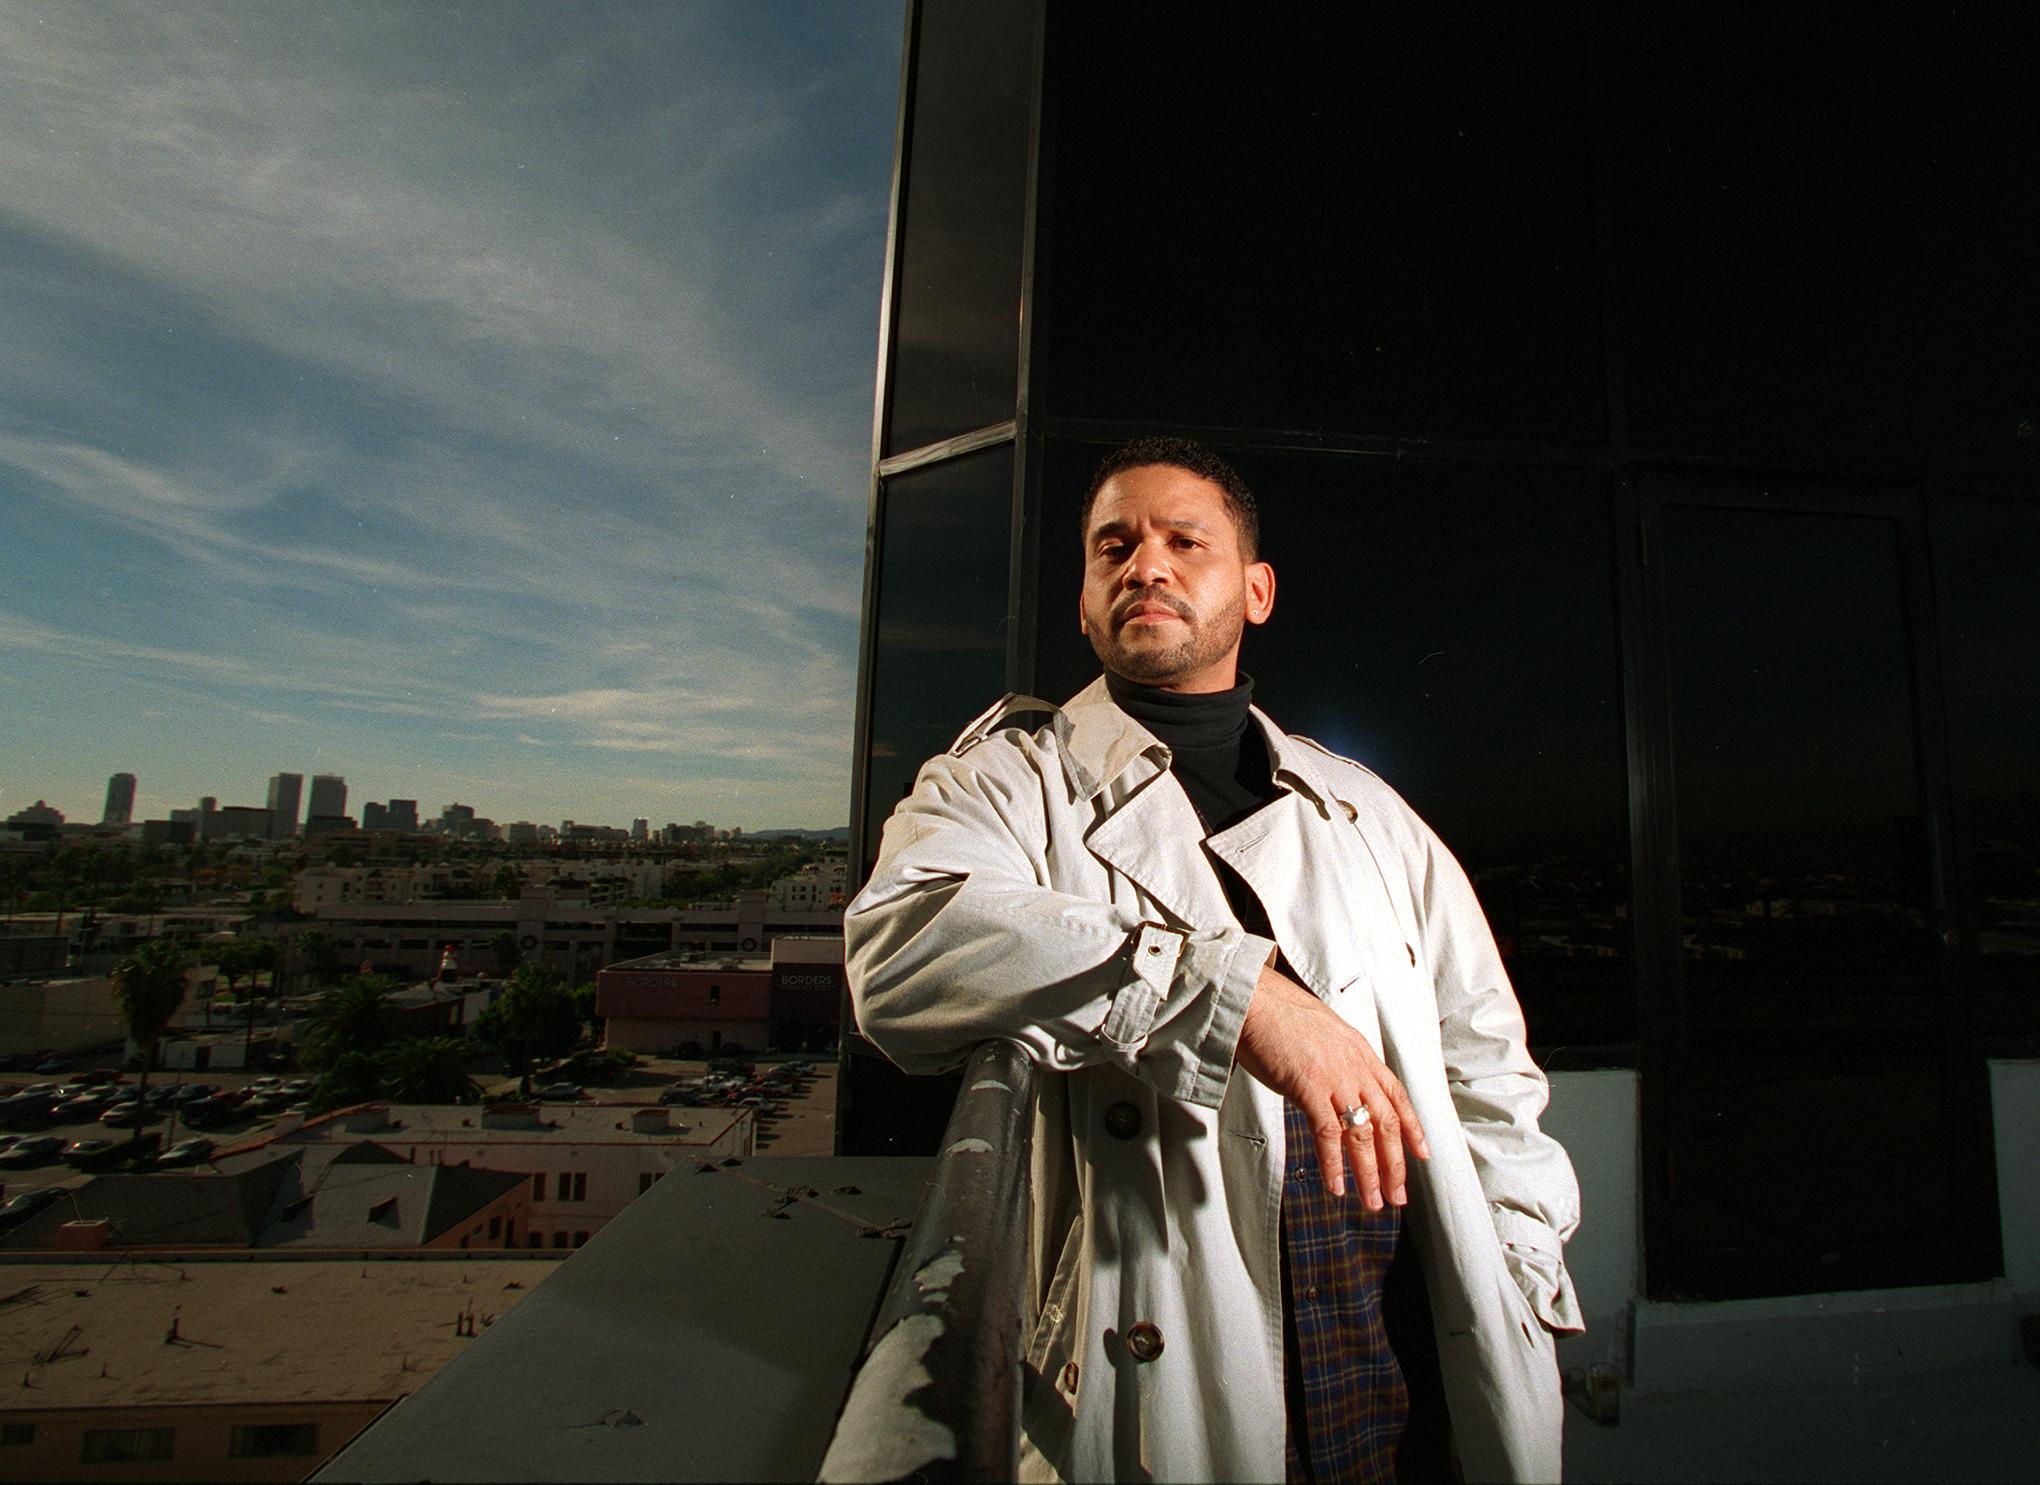 CA.Medina#1.12–17.BC/C.Record producer Benny Medina on the balcony of his Miracle Mile office after